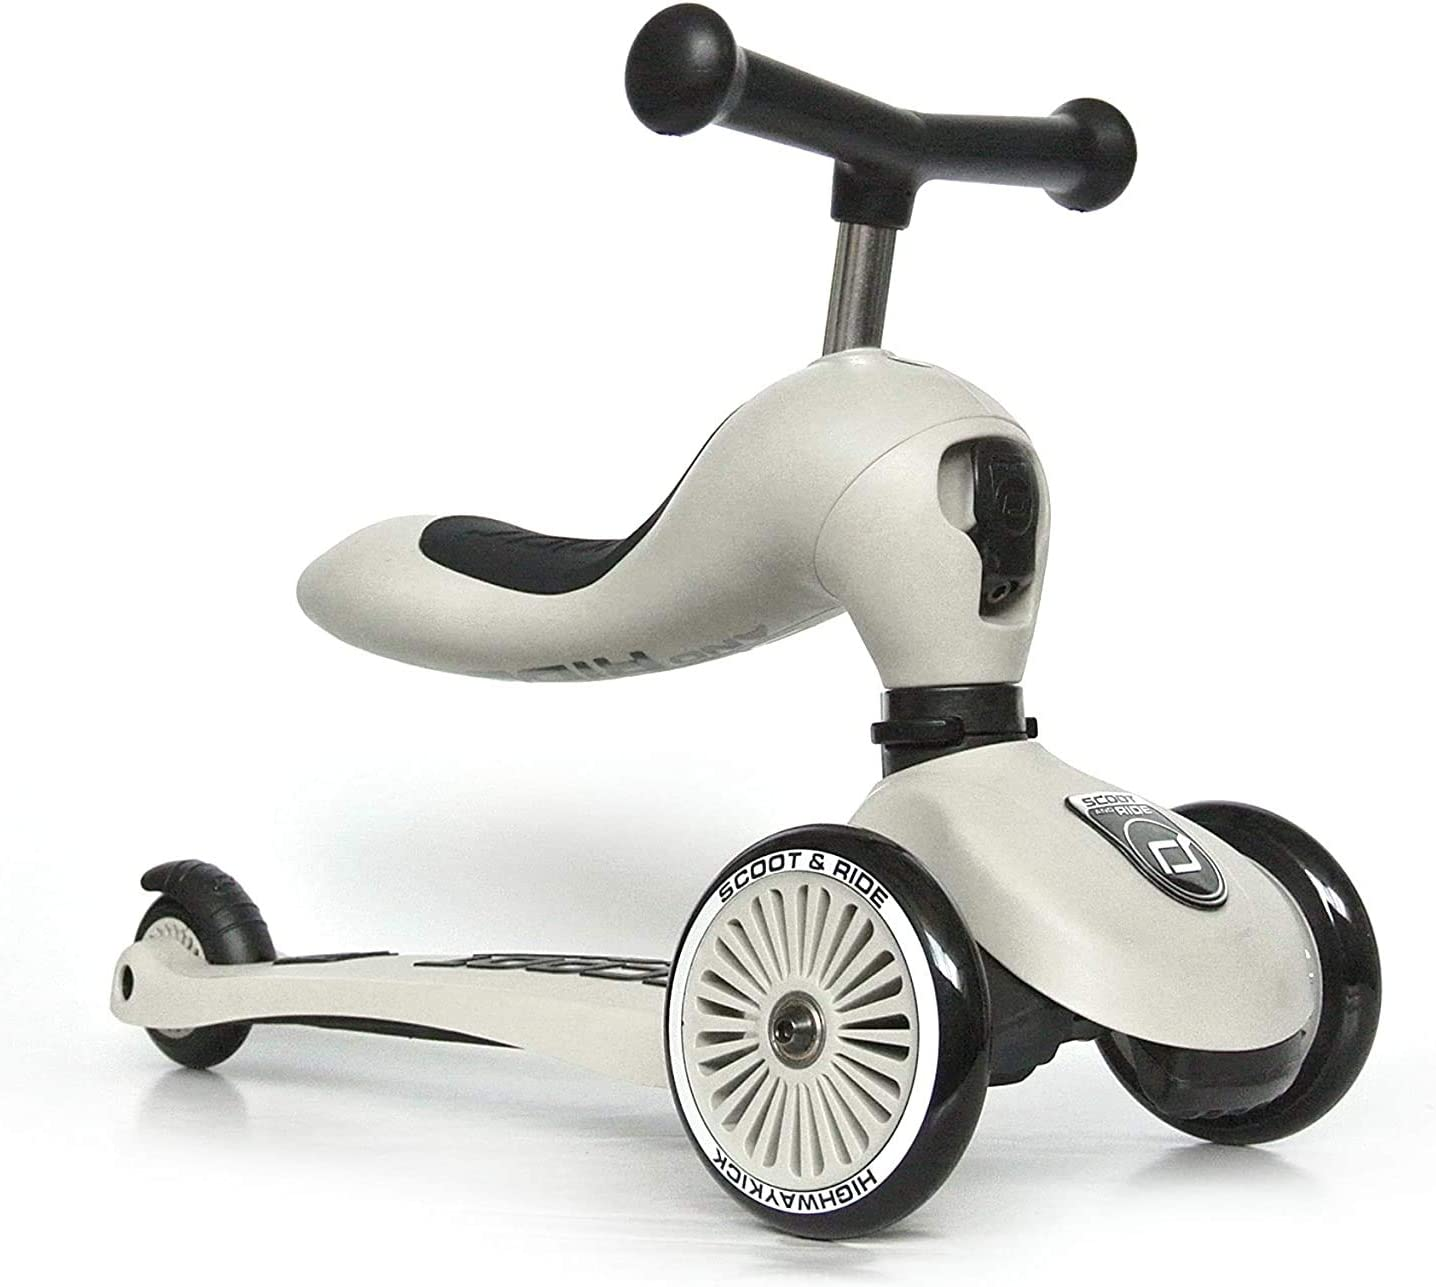 Scoot & Ride 3415 - Juguetes de entretenimiento y aprendizaje, unisex